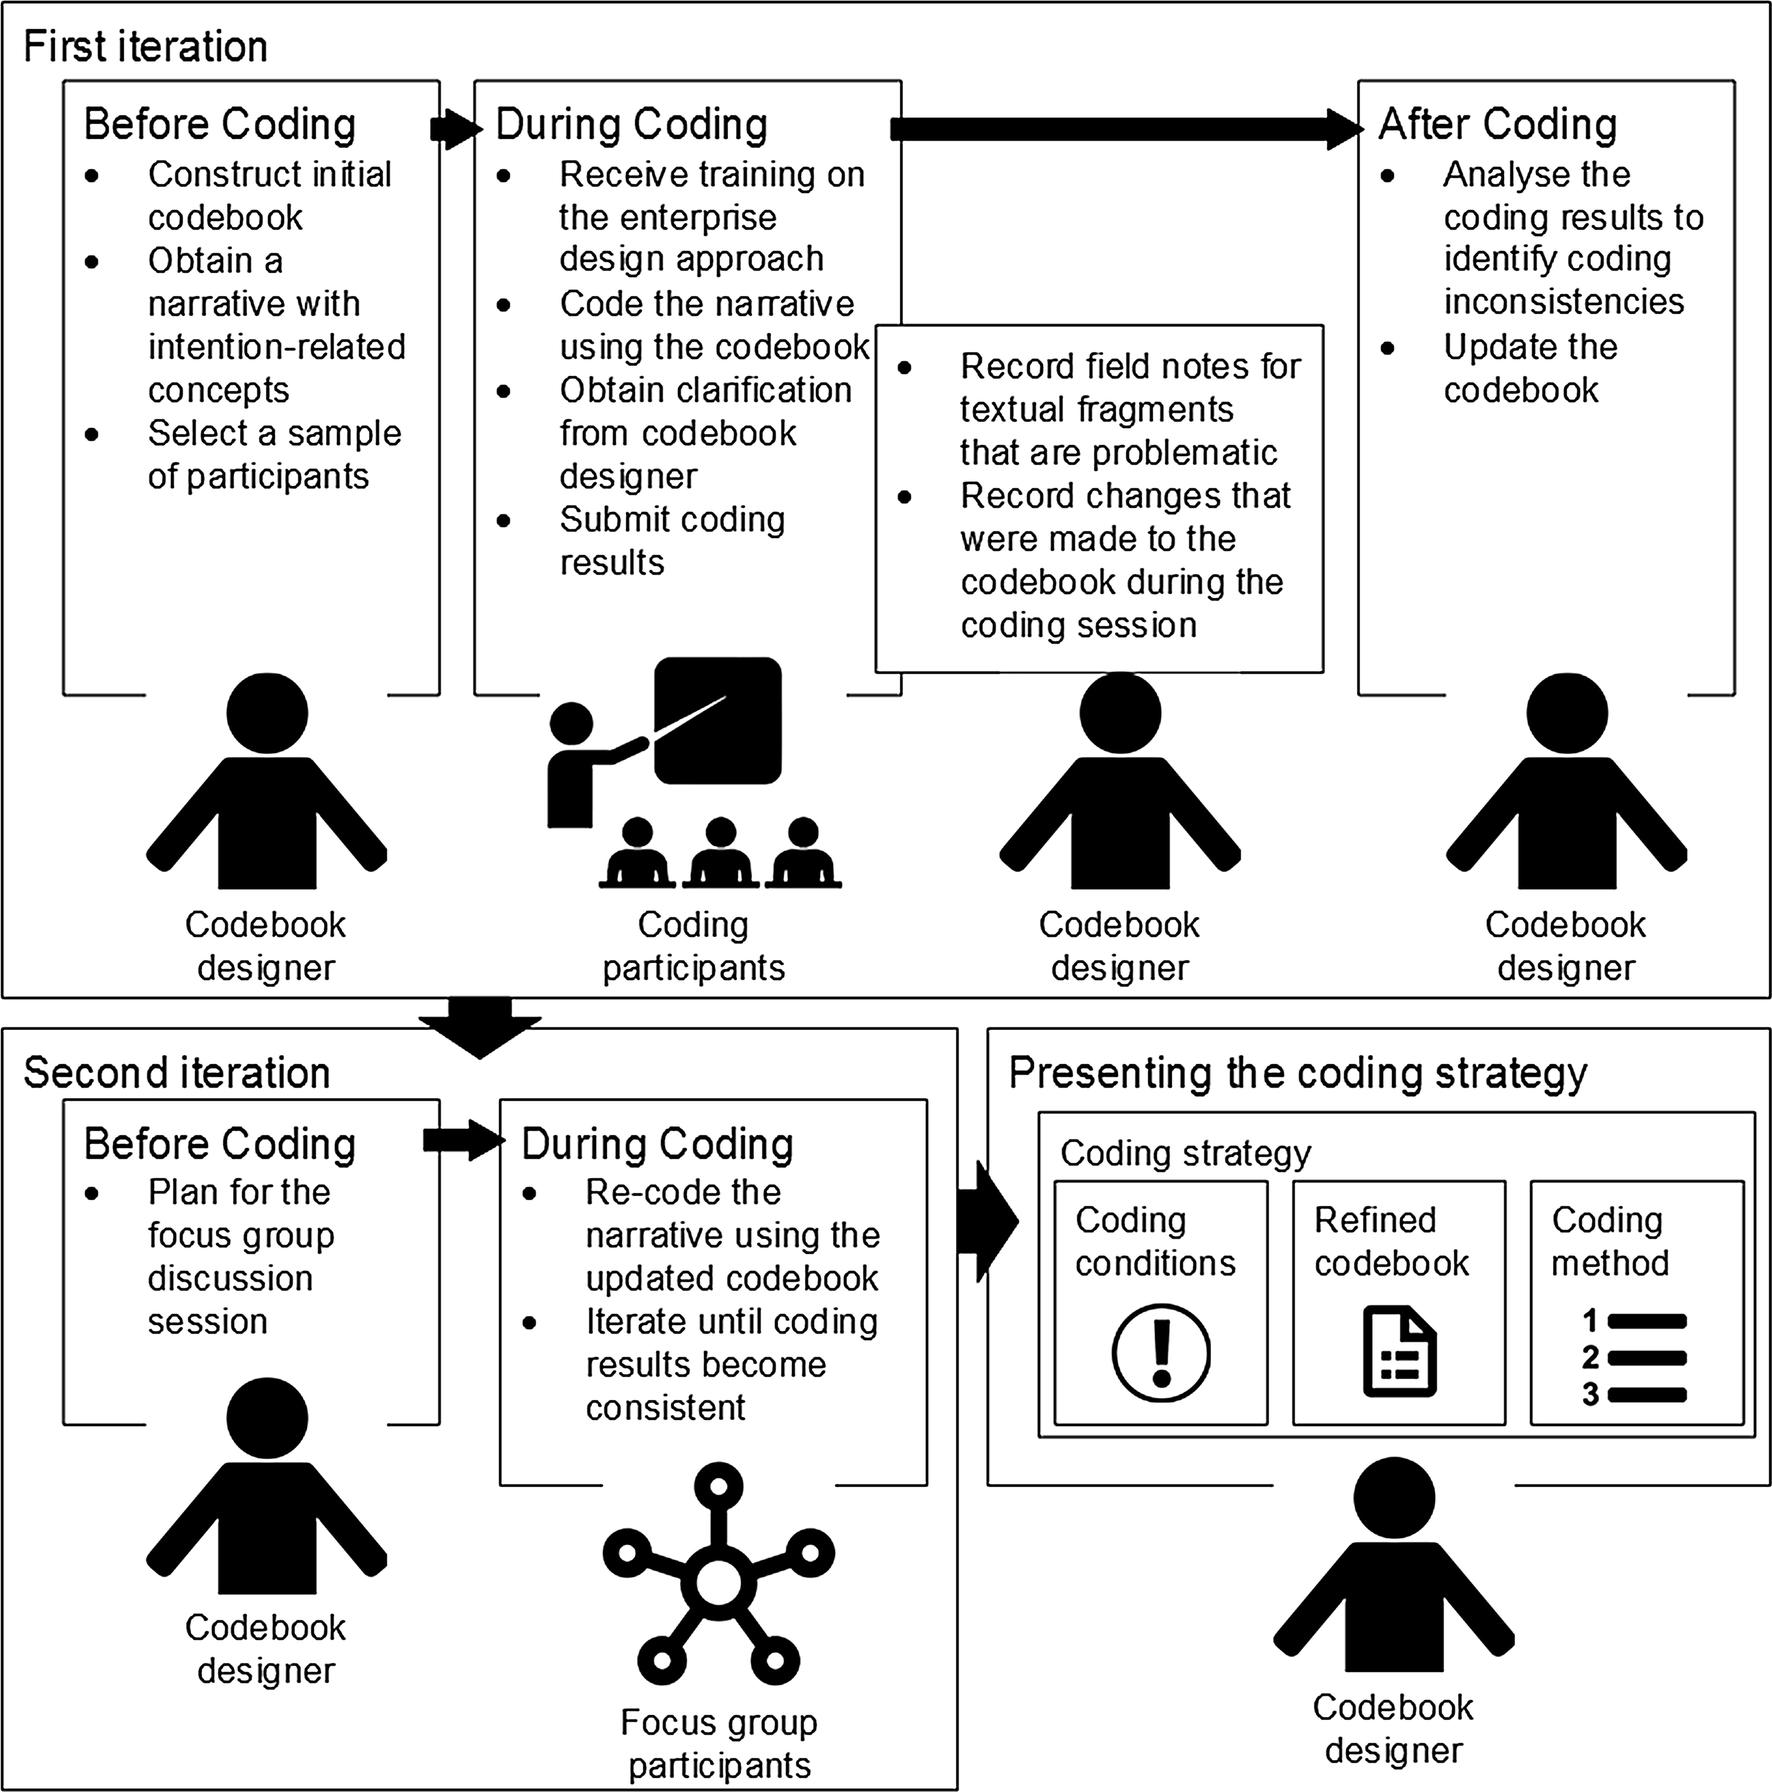 Reducing ambiguity during enterprise design | SpringerLink